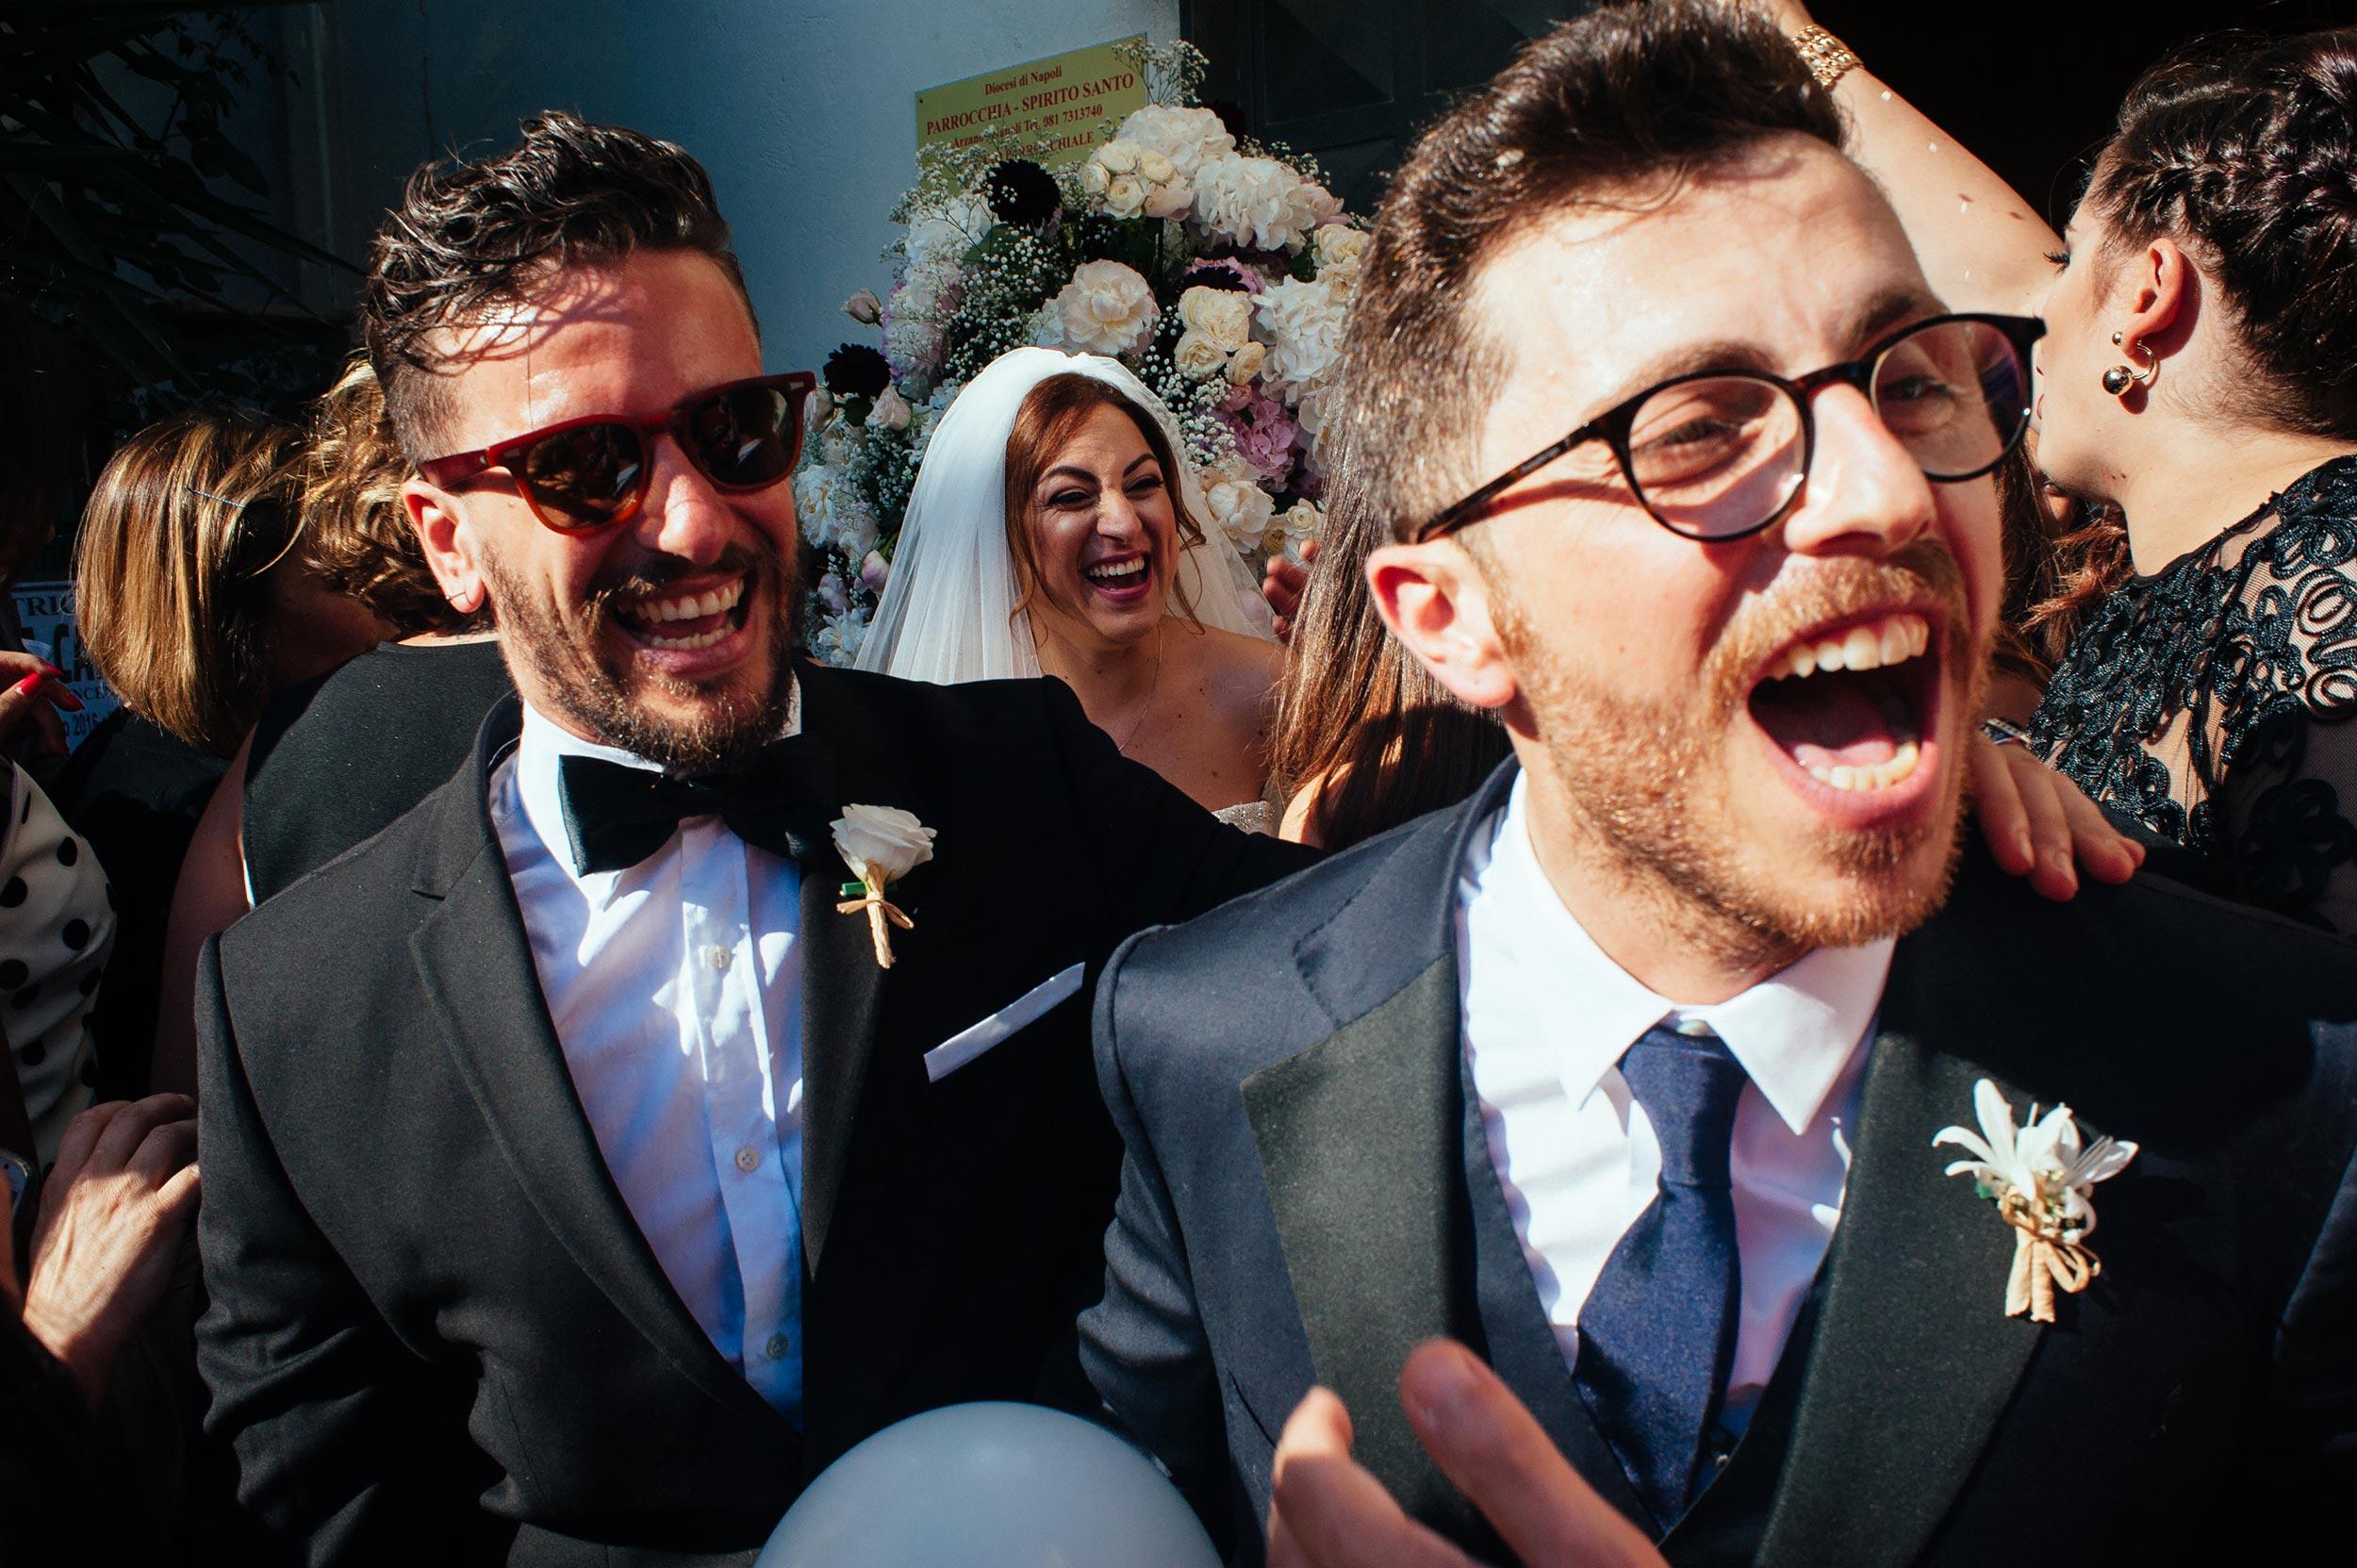 2016-Claudio-Teresa-Naples-Wedding-Photographer-Italy-Alessandro-Avenali-56.jpg